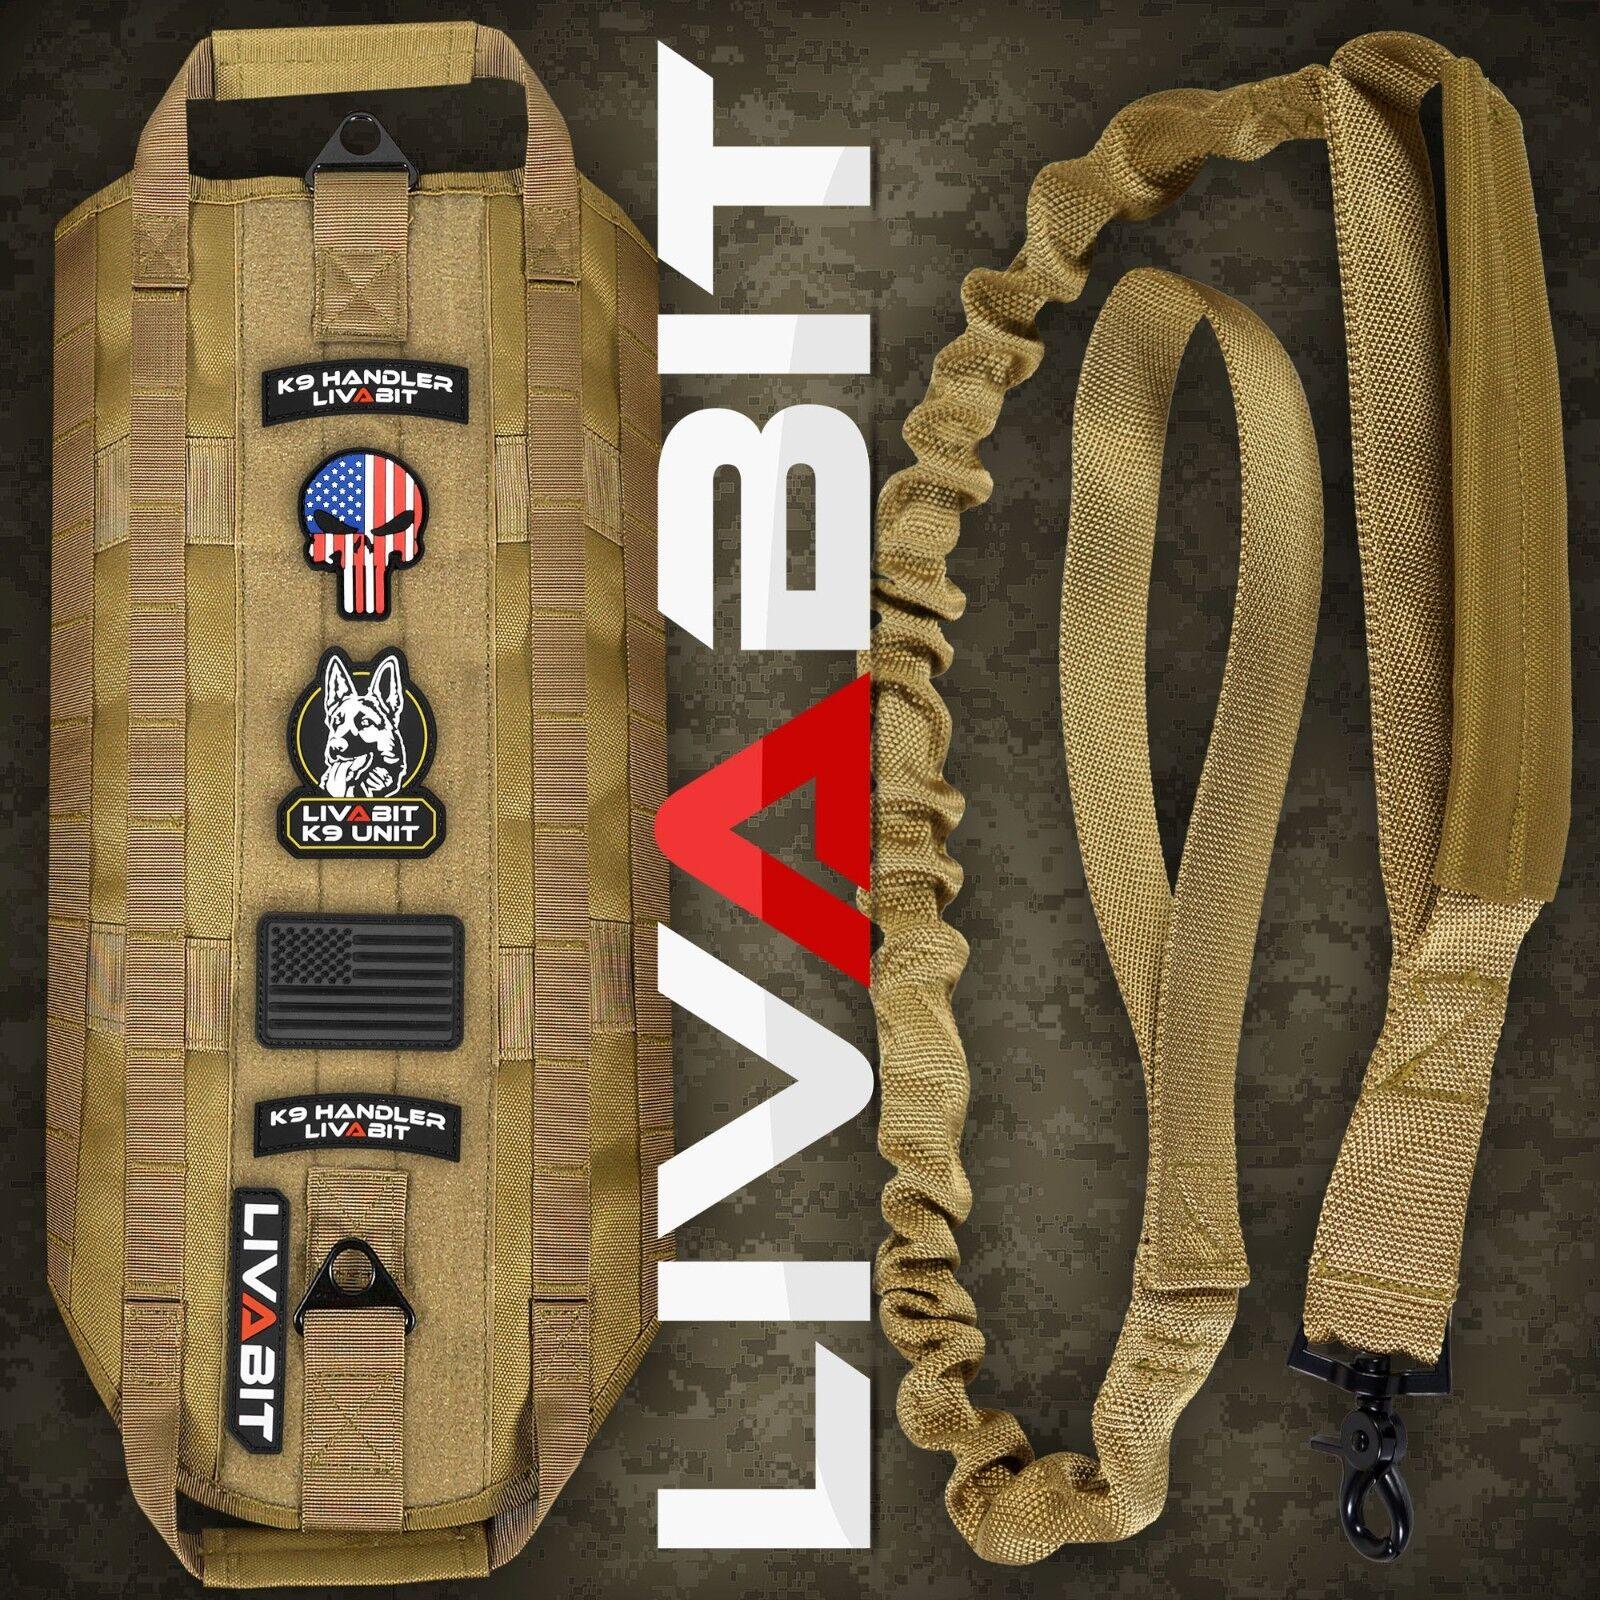 LIVABIT K9 Dog Tactical Vest Harness PVC Patch Heavy Duty Bungee Leash Tan Small